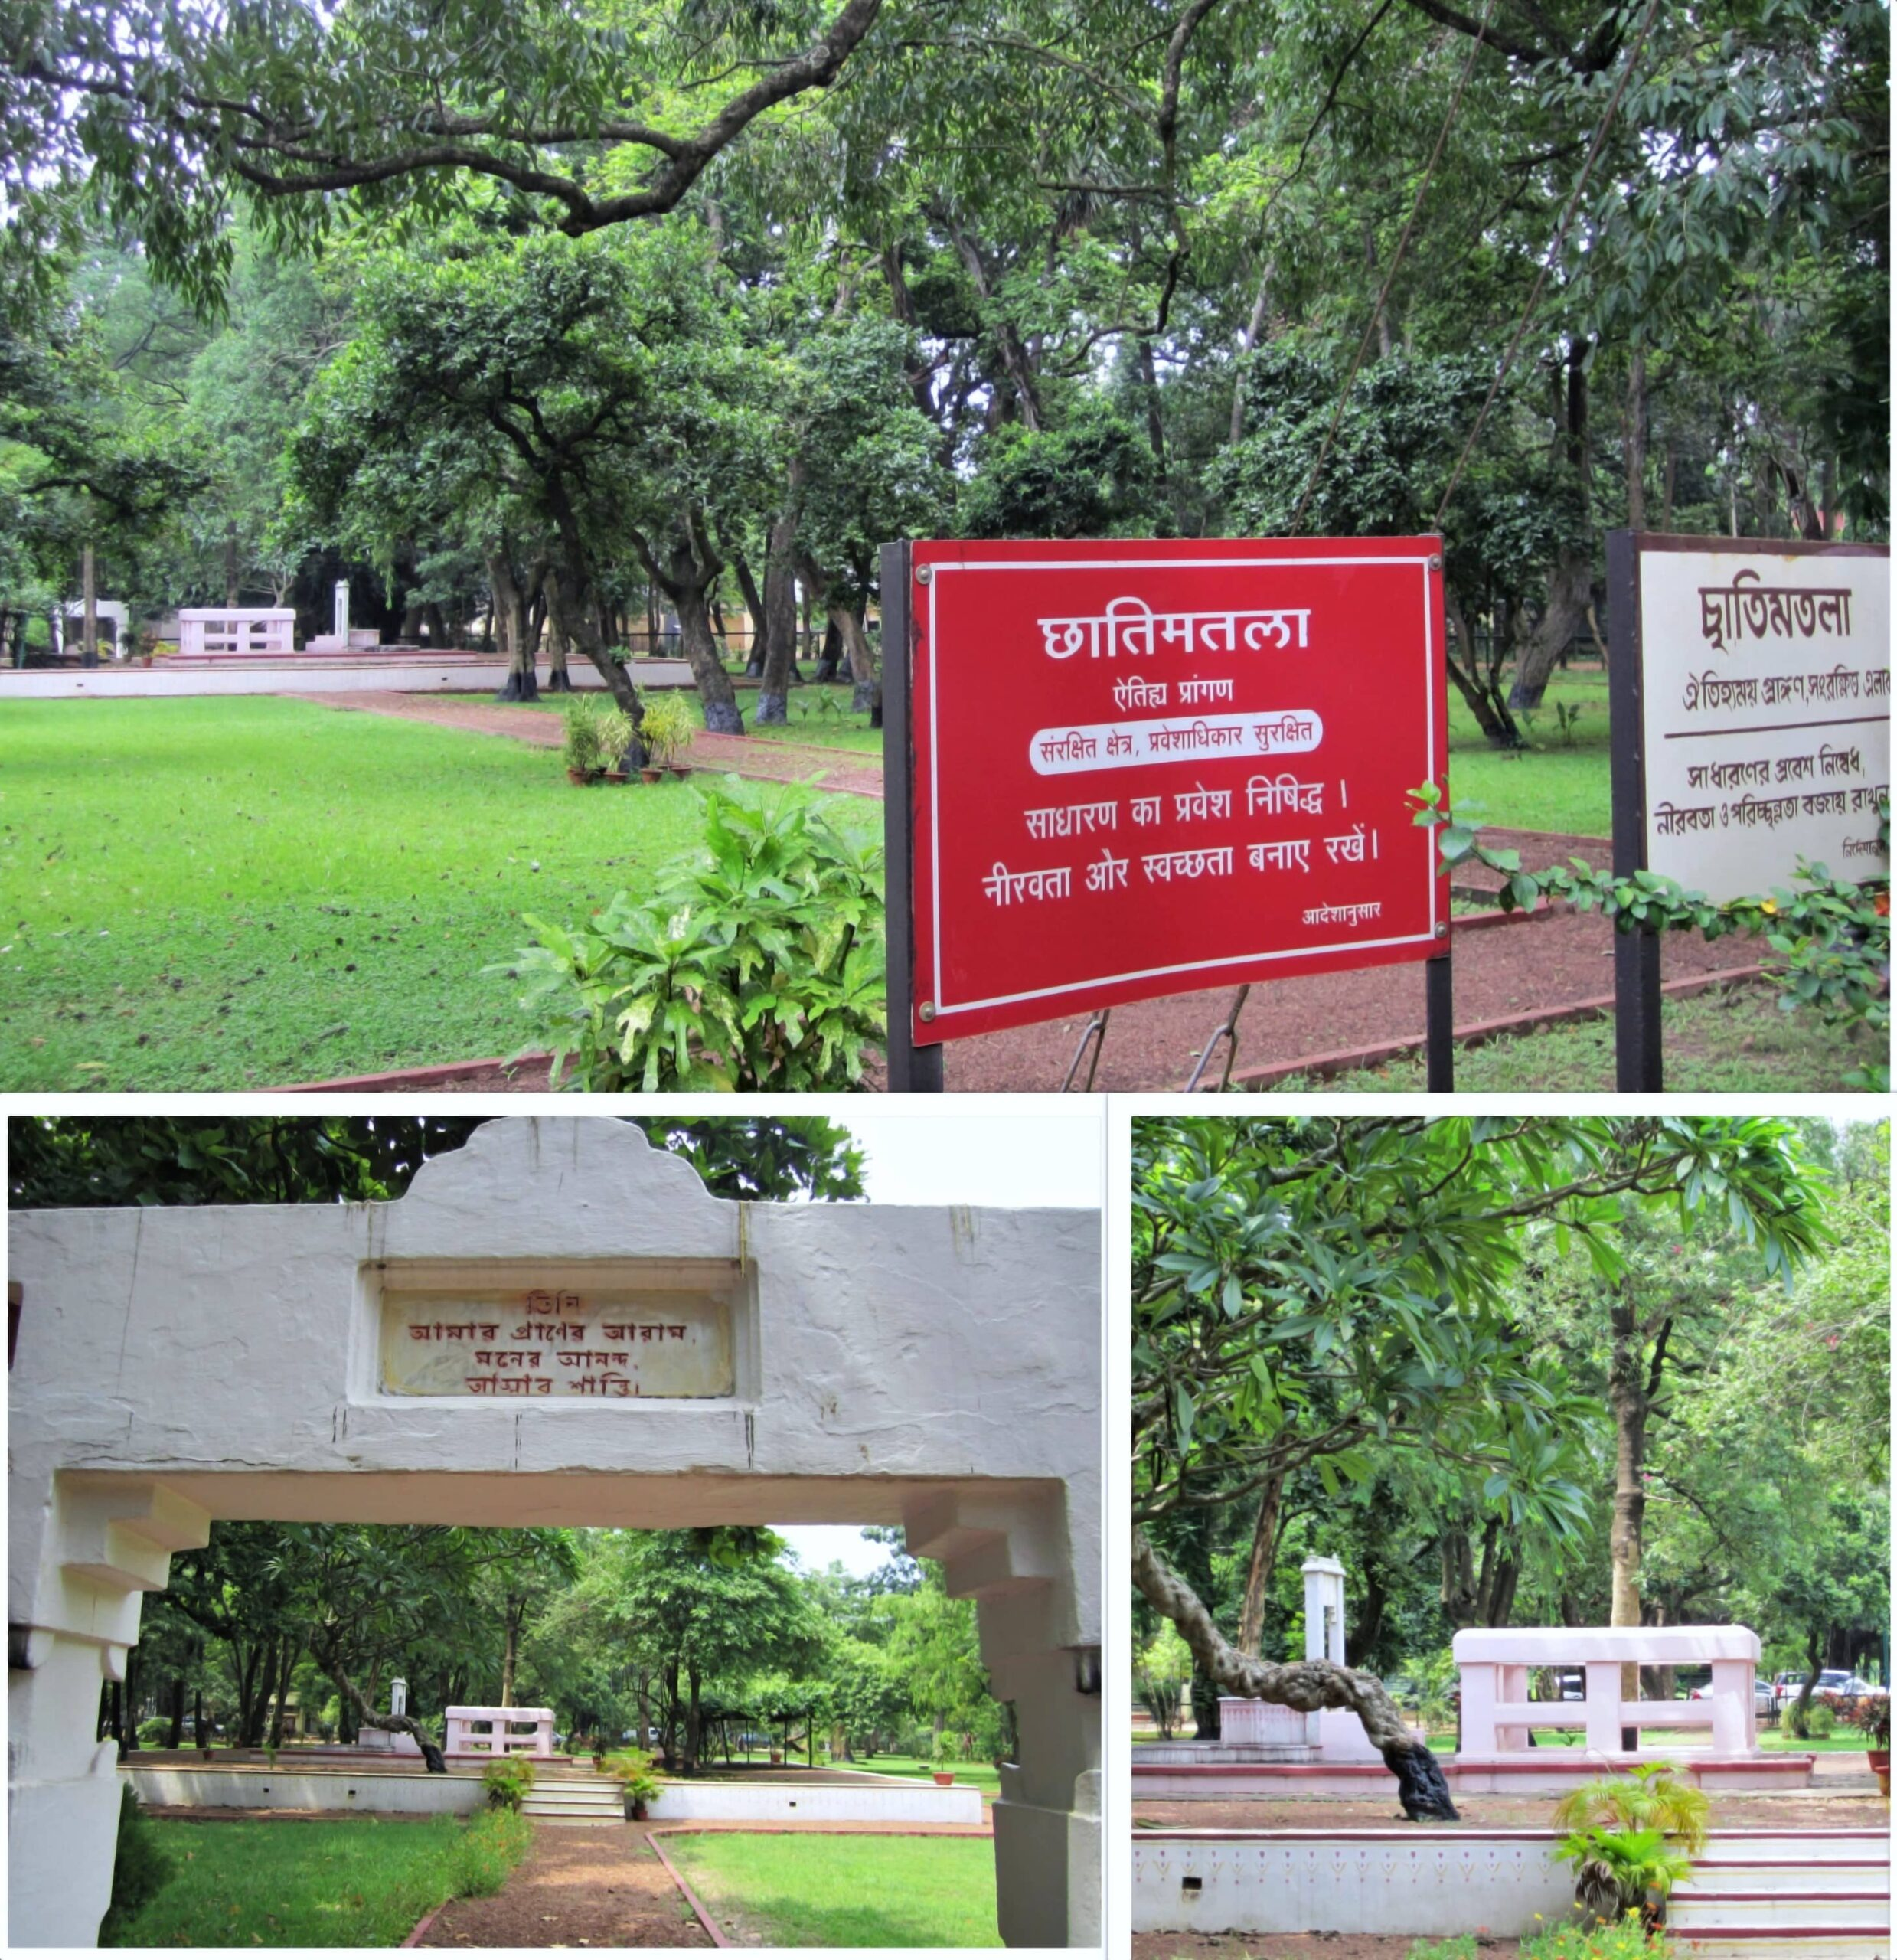 The Famous Chhatim Tala